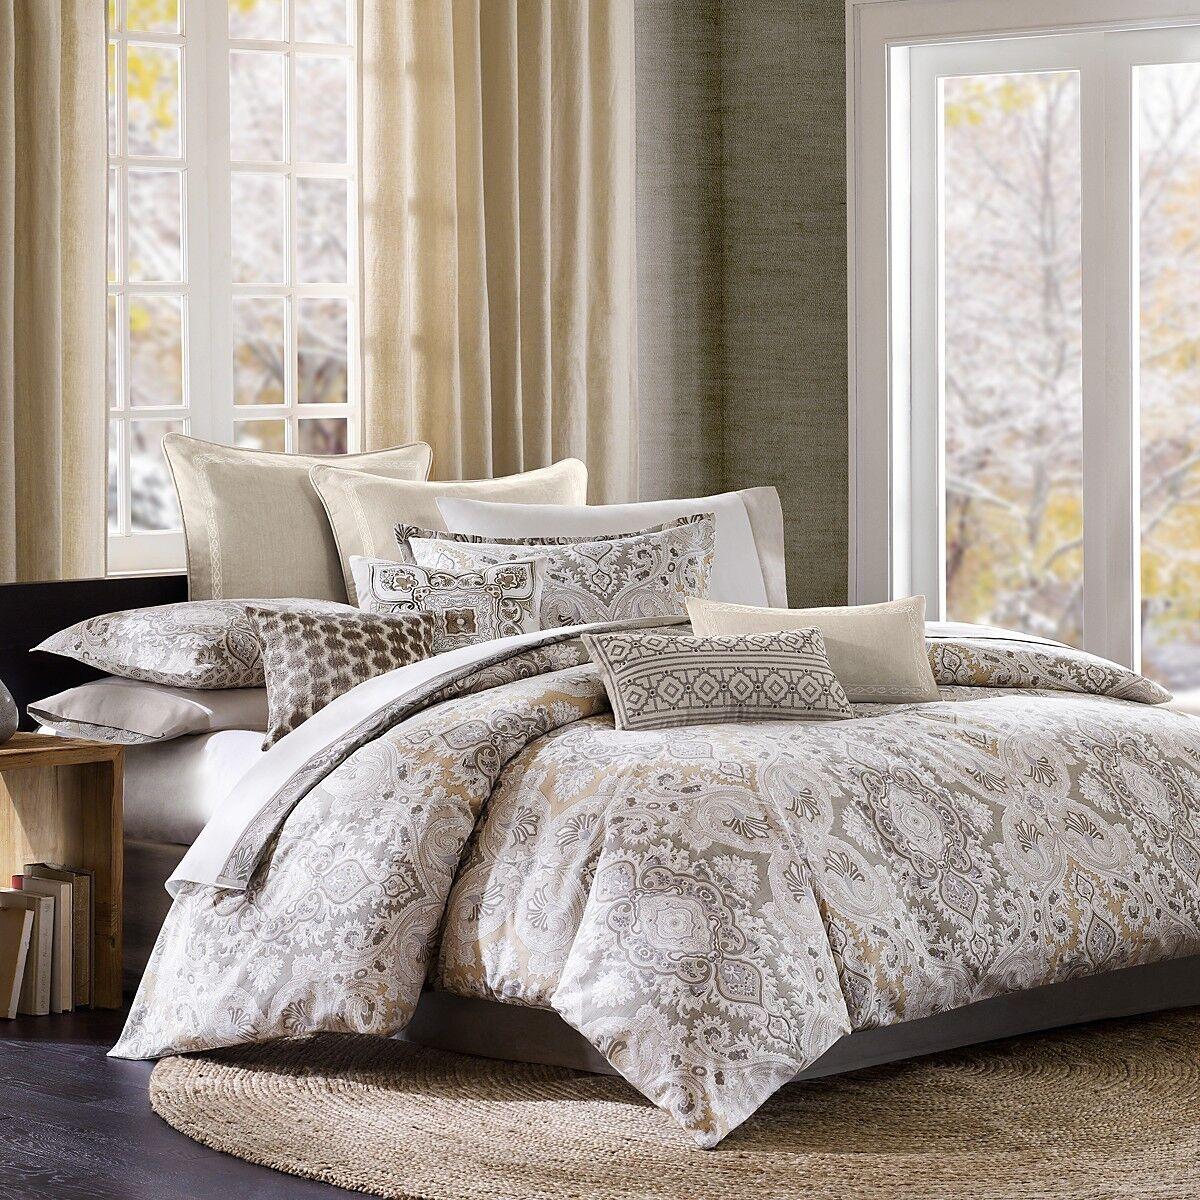 Echo Bedding Odyssey 2-PC Cotton Polyester TWIN Comforter Set Beige  282 3 G2170